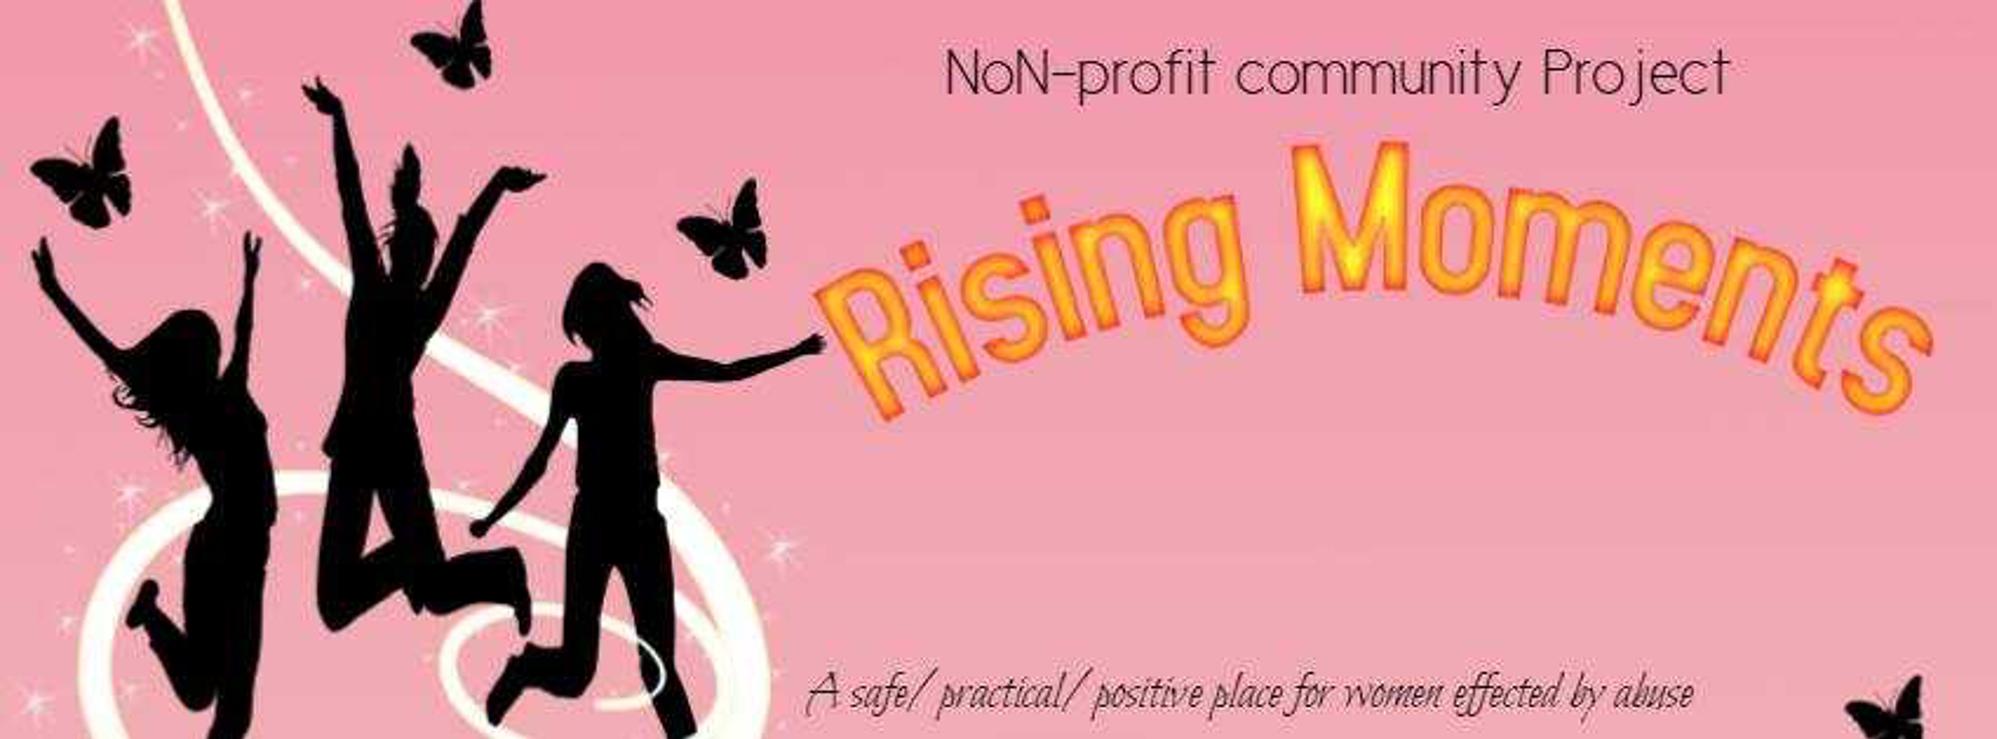 Rising Moments